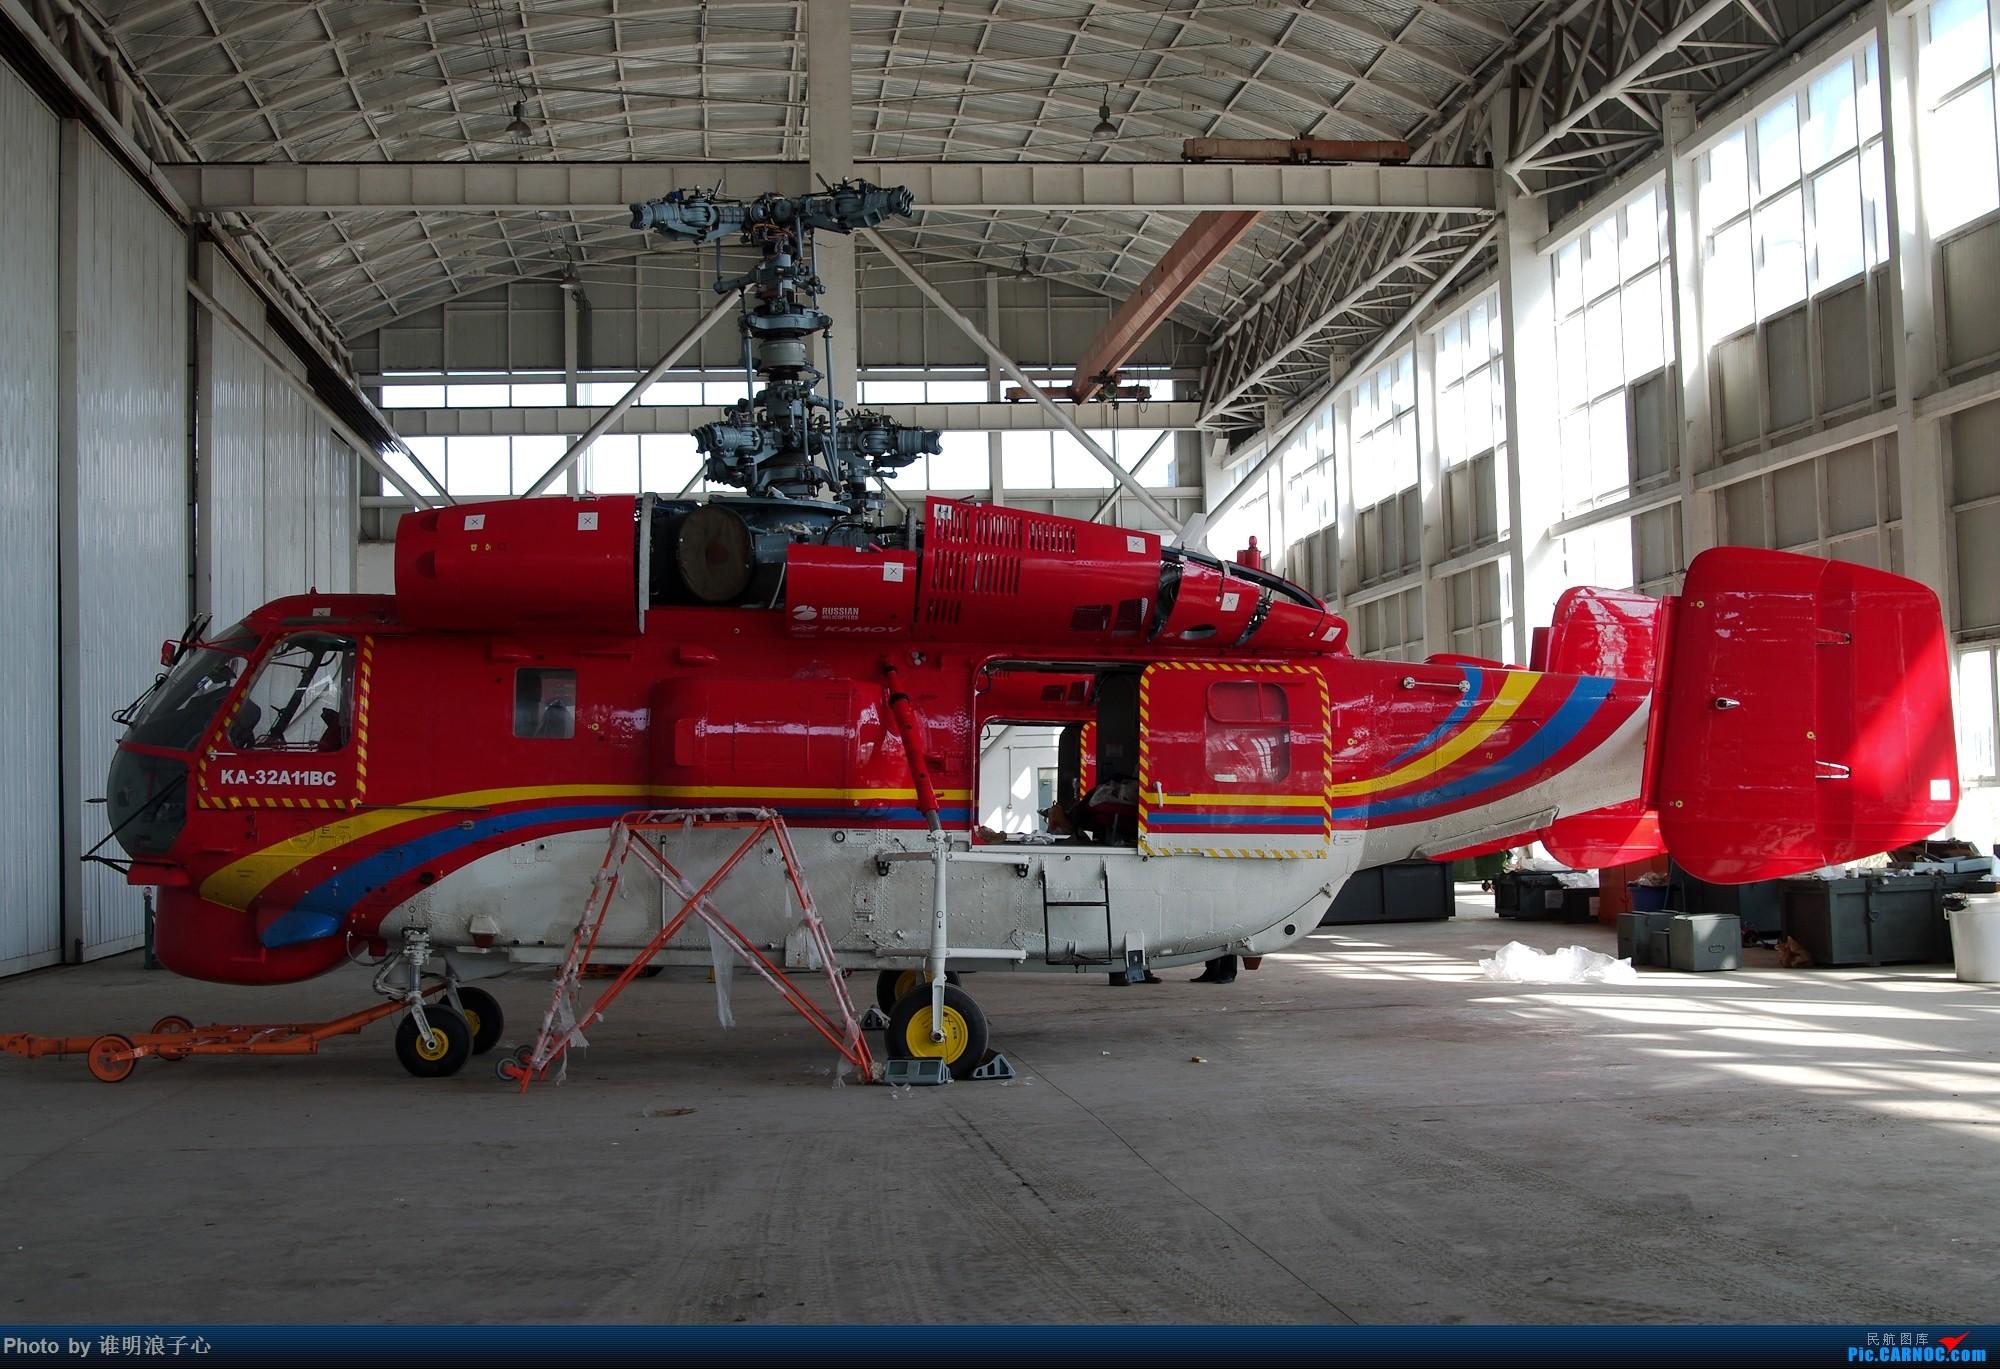 Re:[原创]***【TSN飞友会】双11海淘的终于到货了-KA-32A11BC****